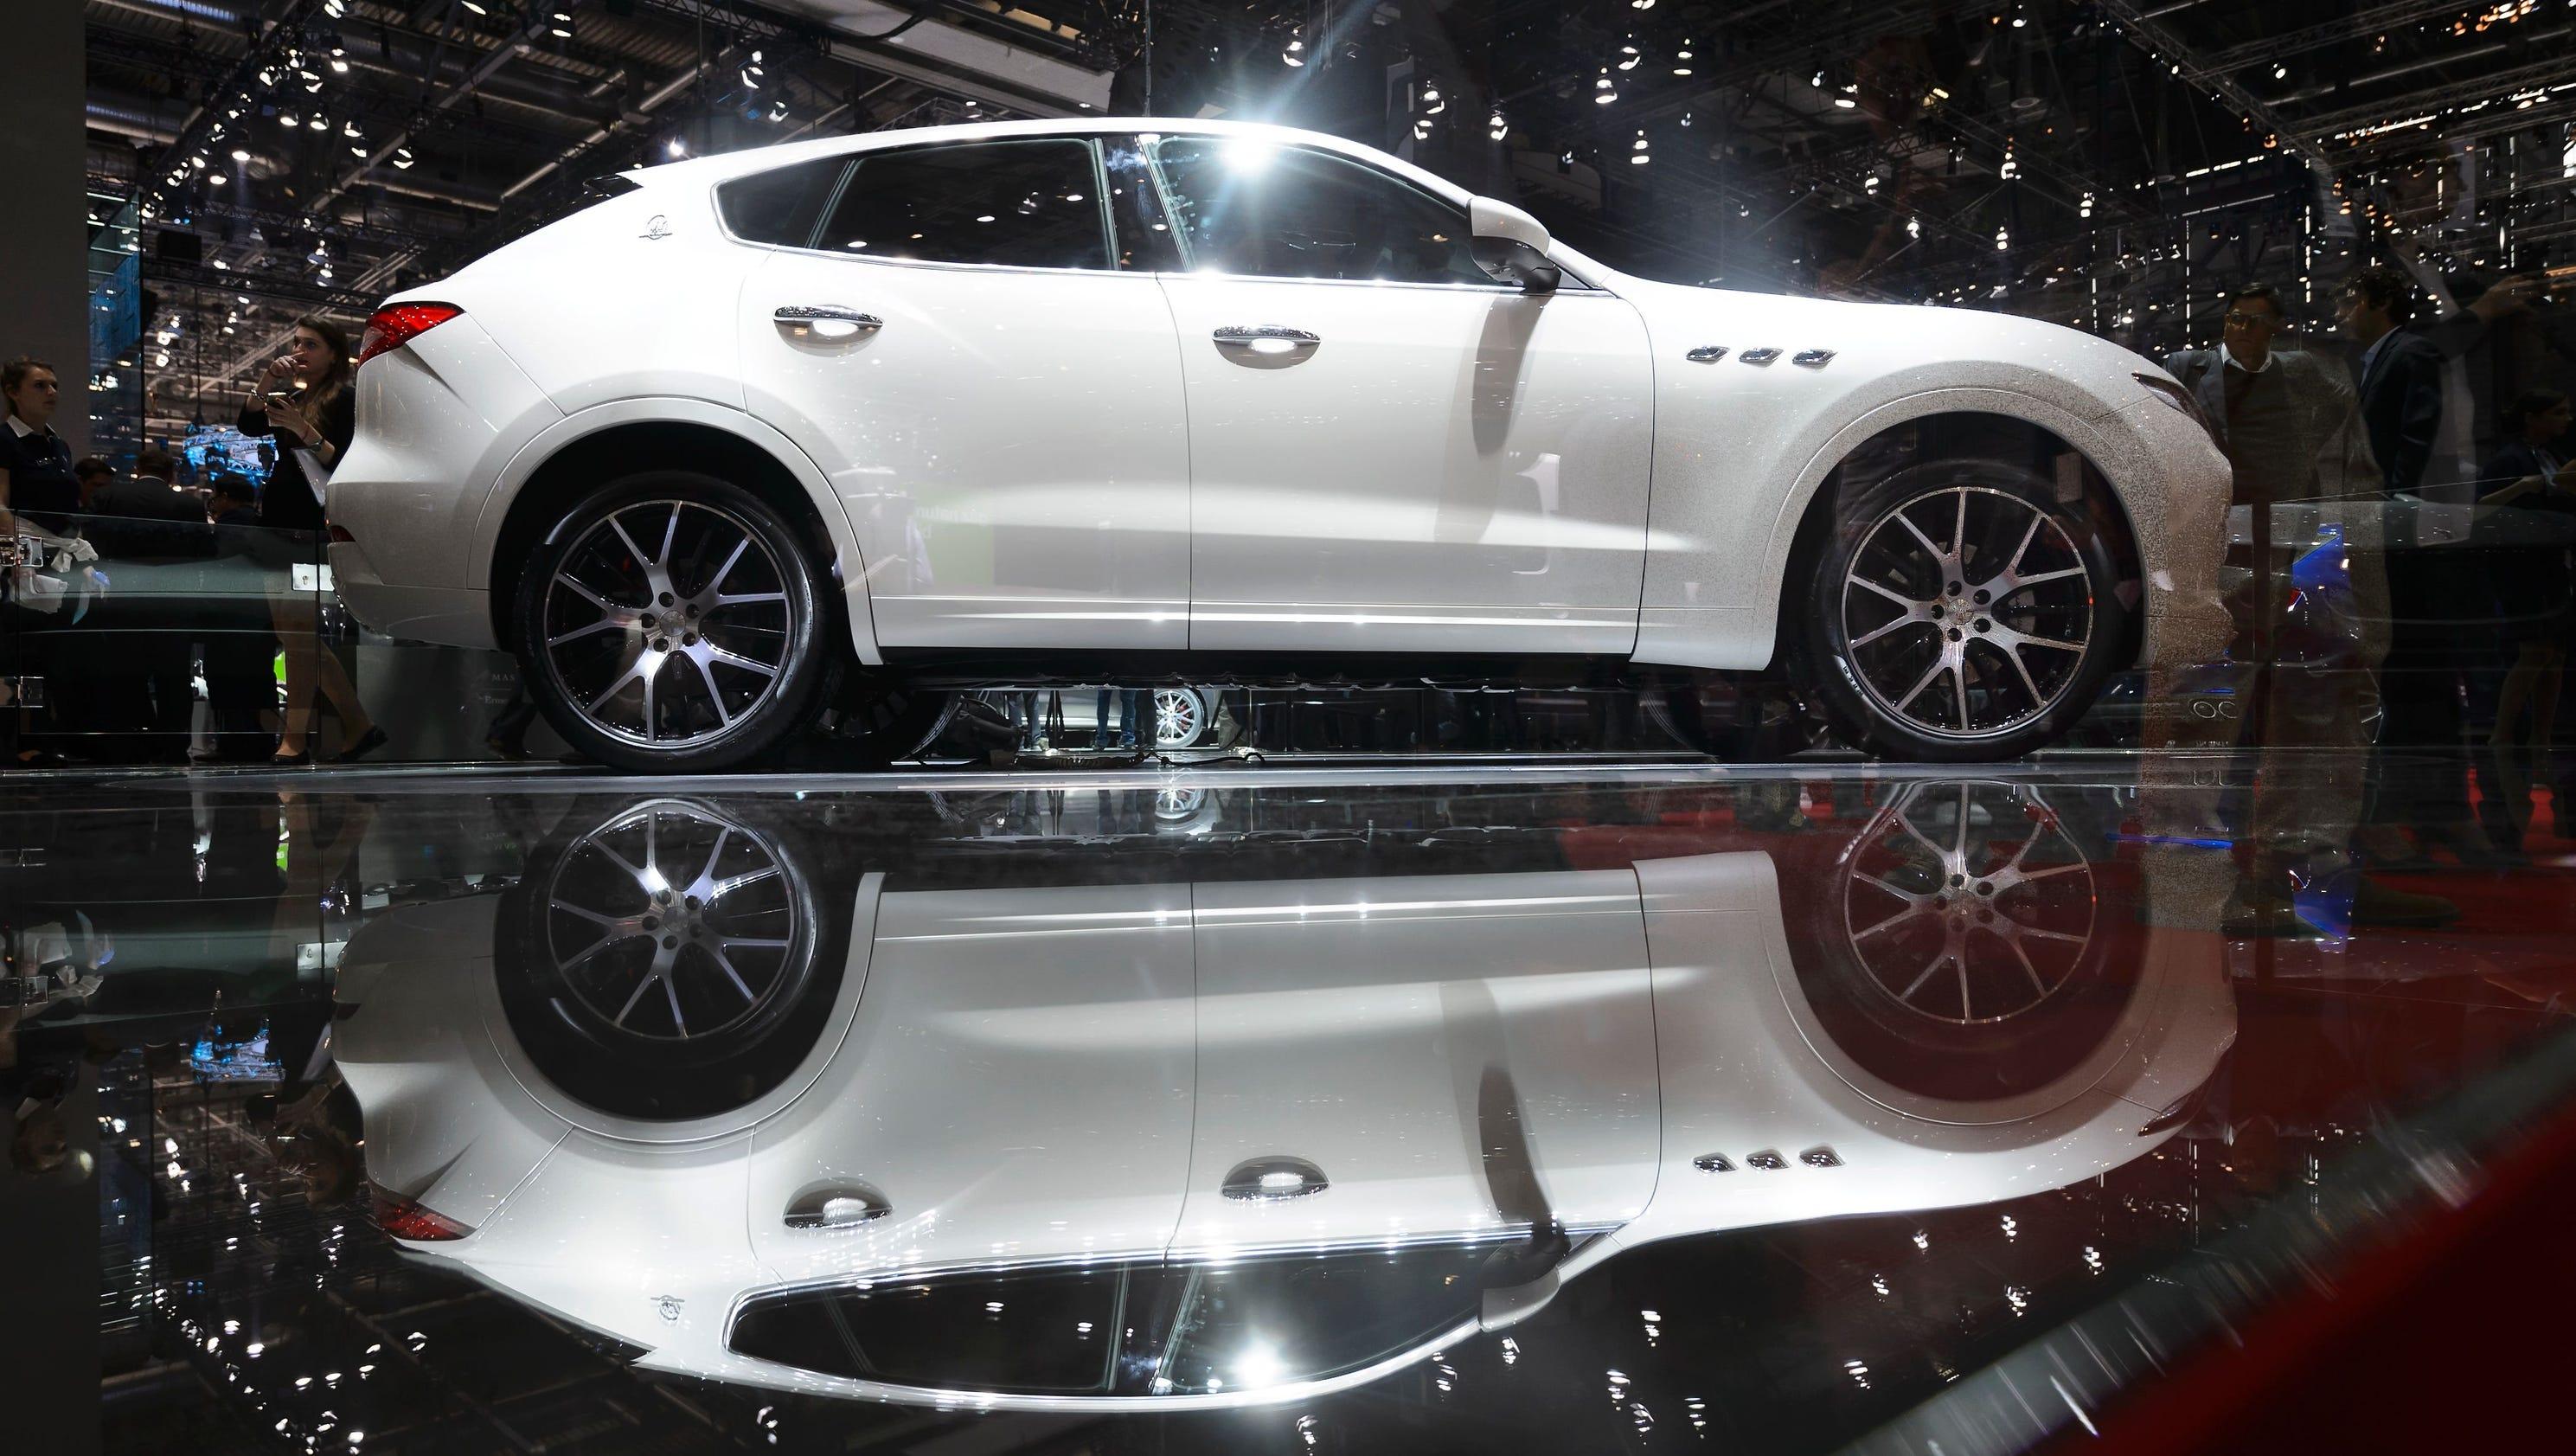 Maserati Makes Move Toward Electric Vehicles